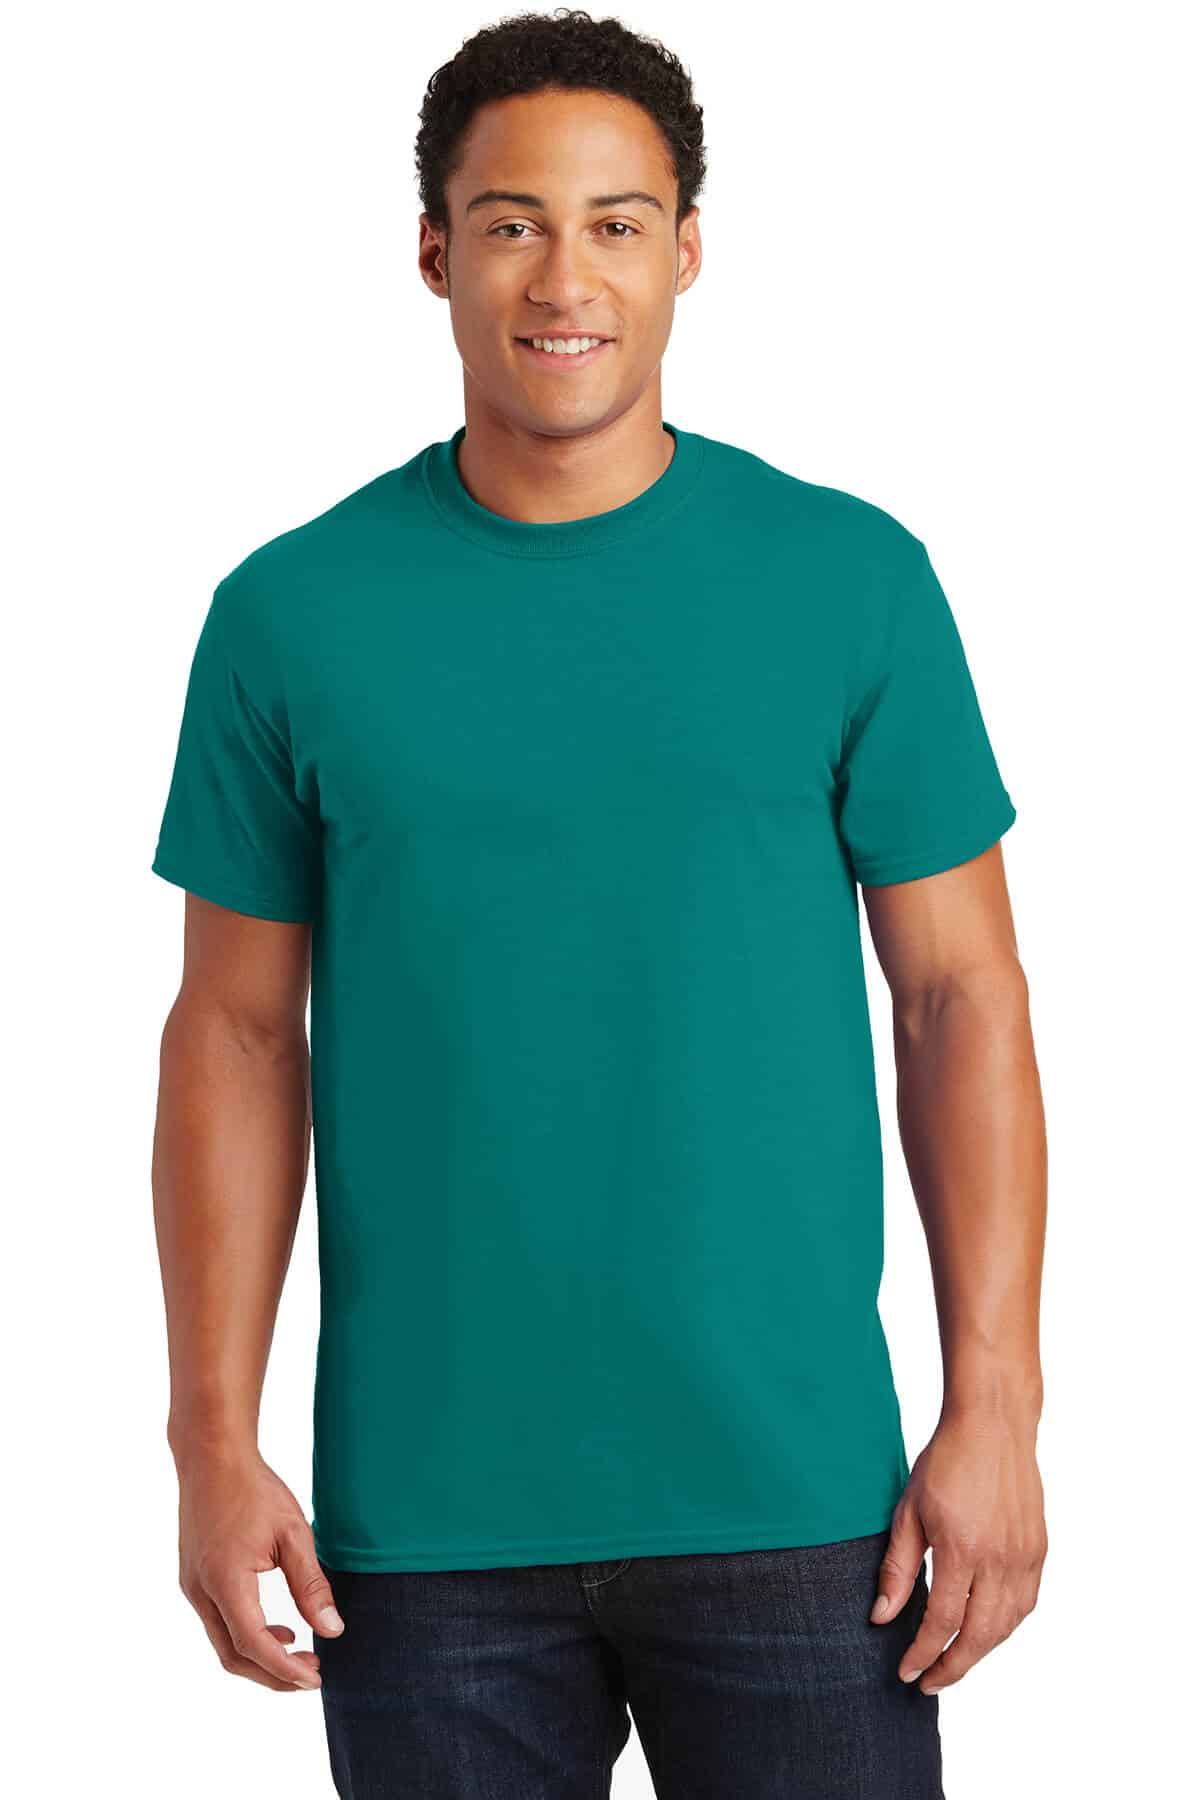 Jade Dome TeeShirt Front